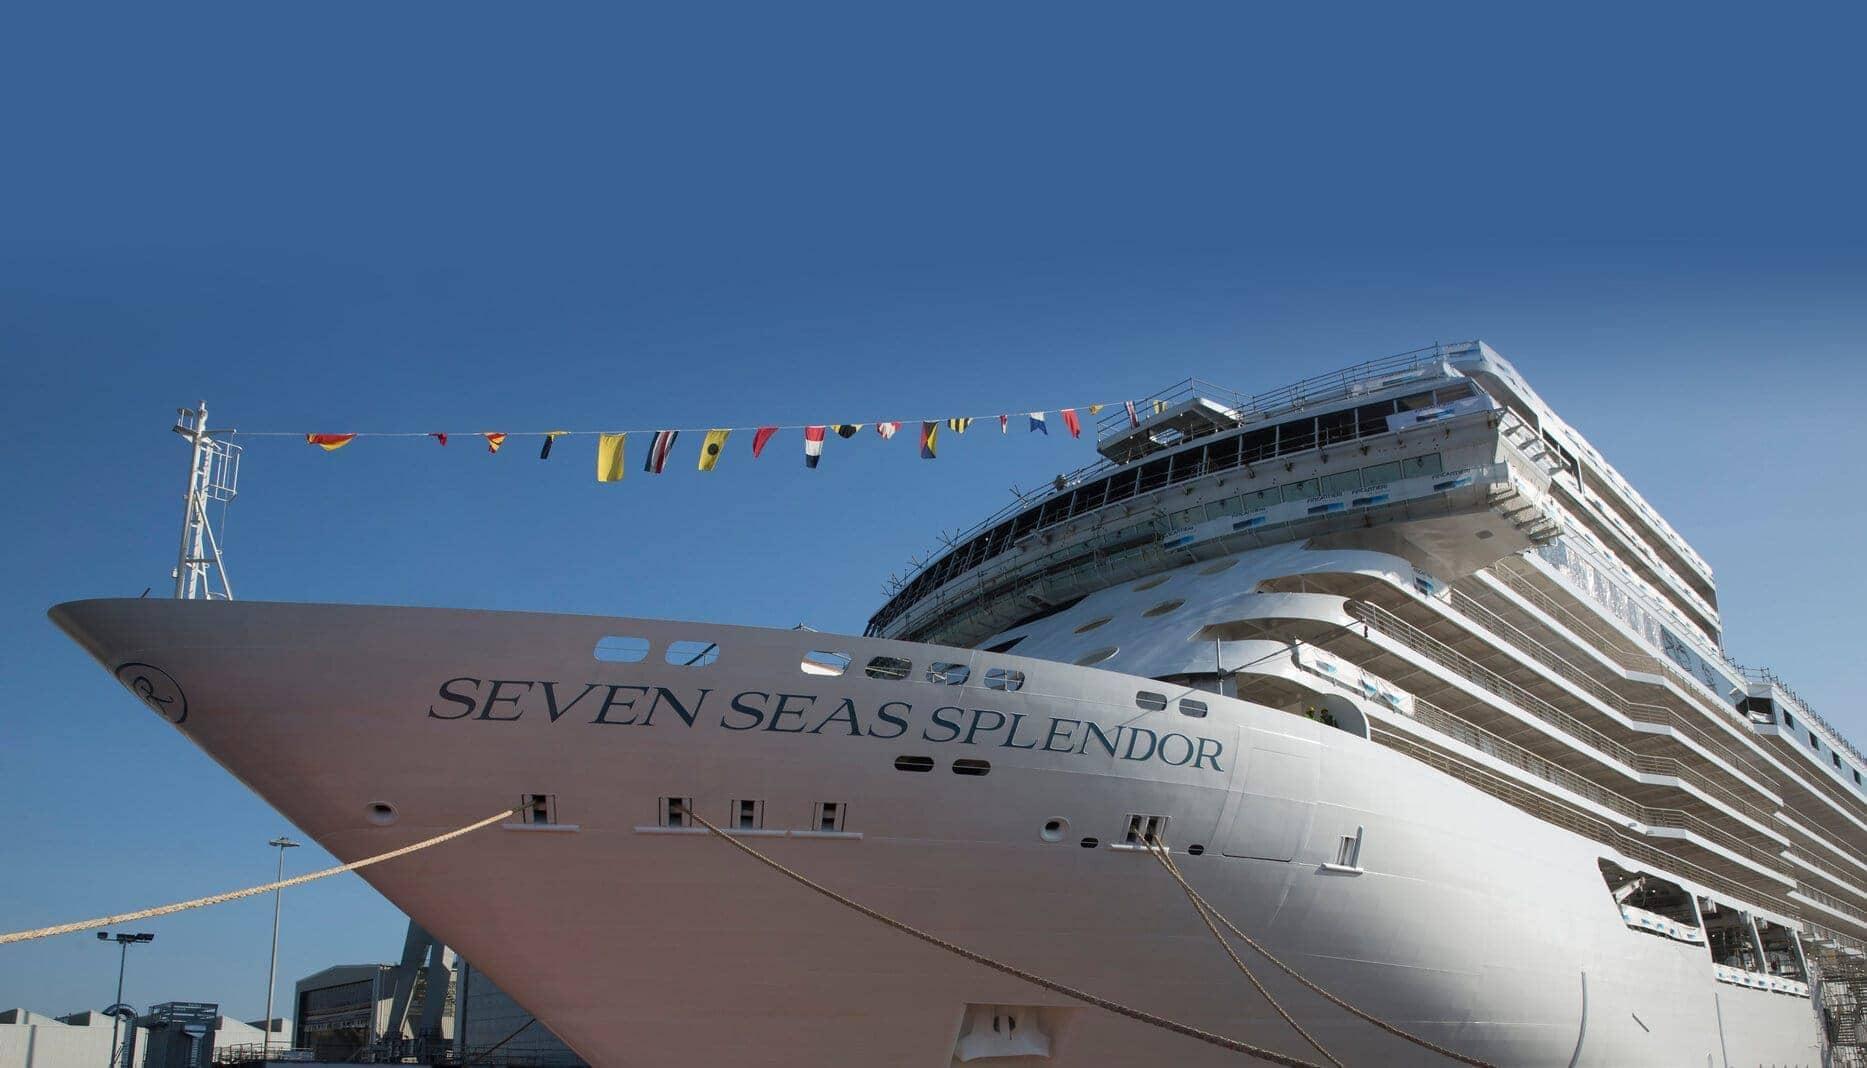 Kreuzfahrtschiff SevenSeas Splendor